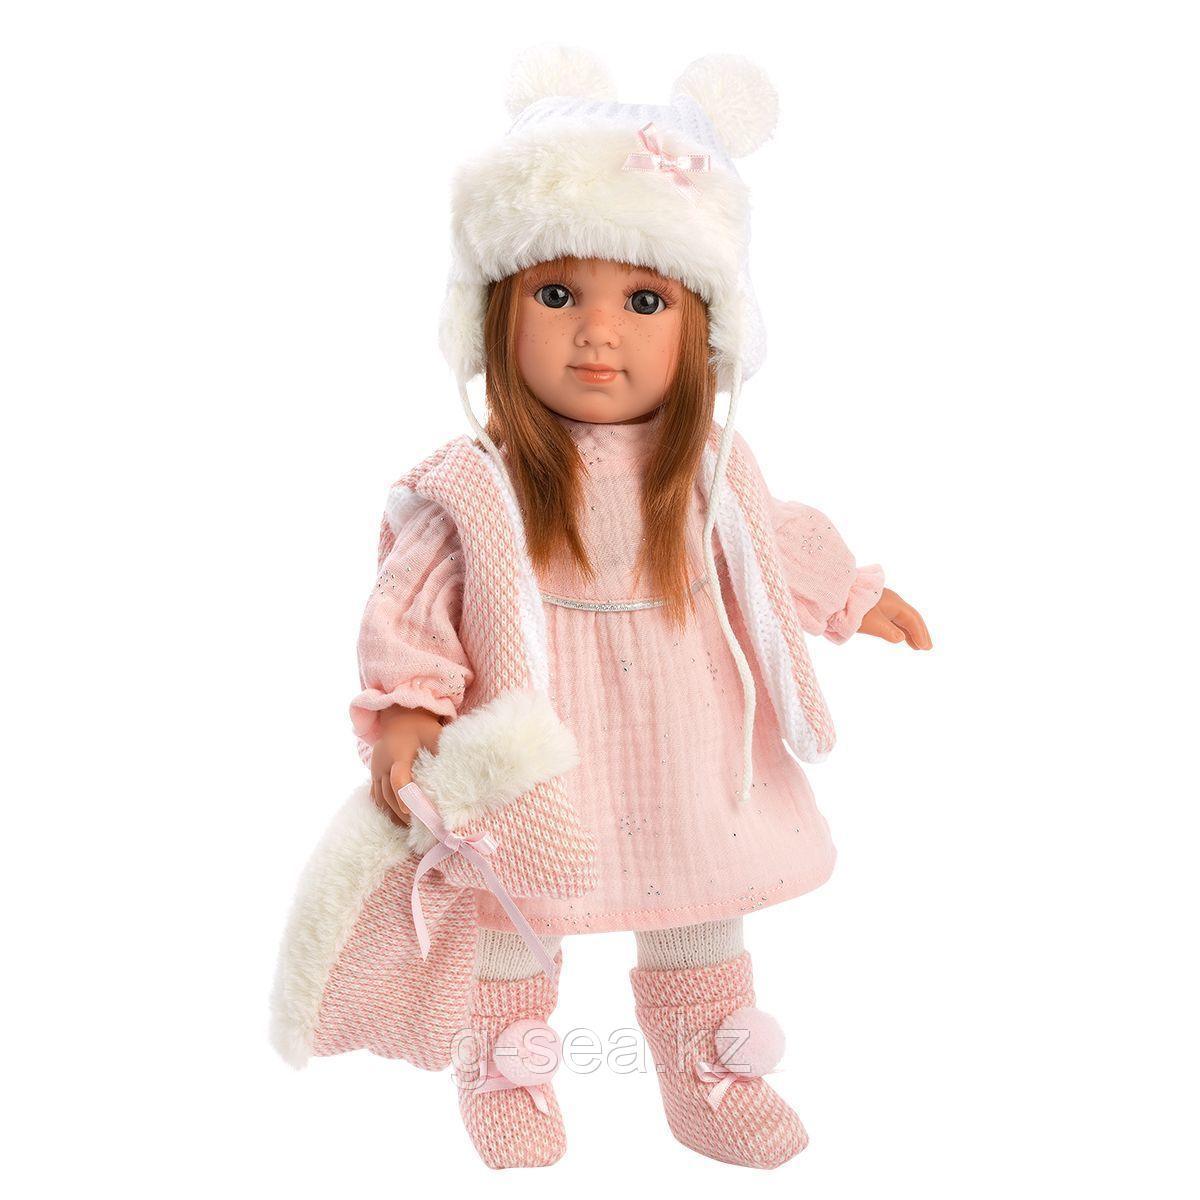 LLORENS: Кукла Николь 35 см., шатенка в розовом костюме